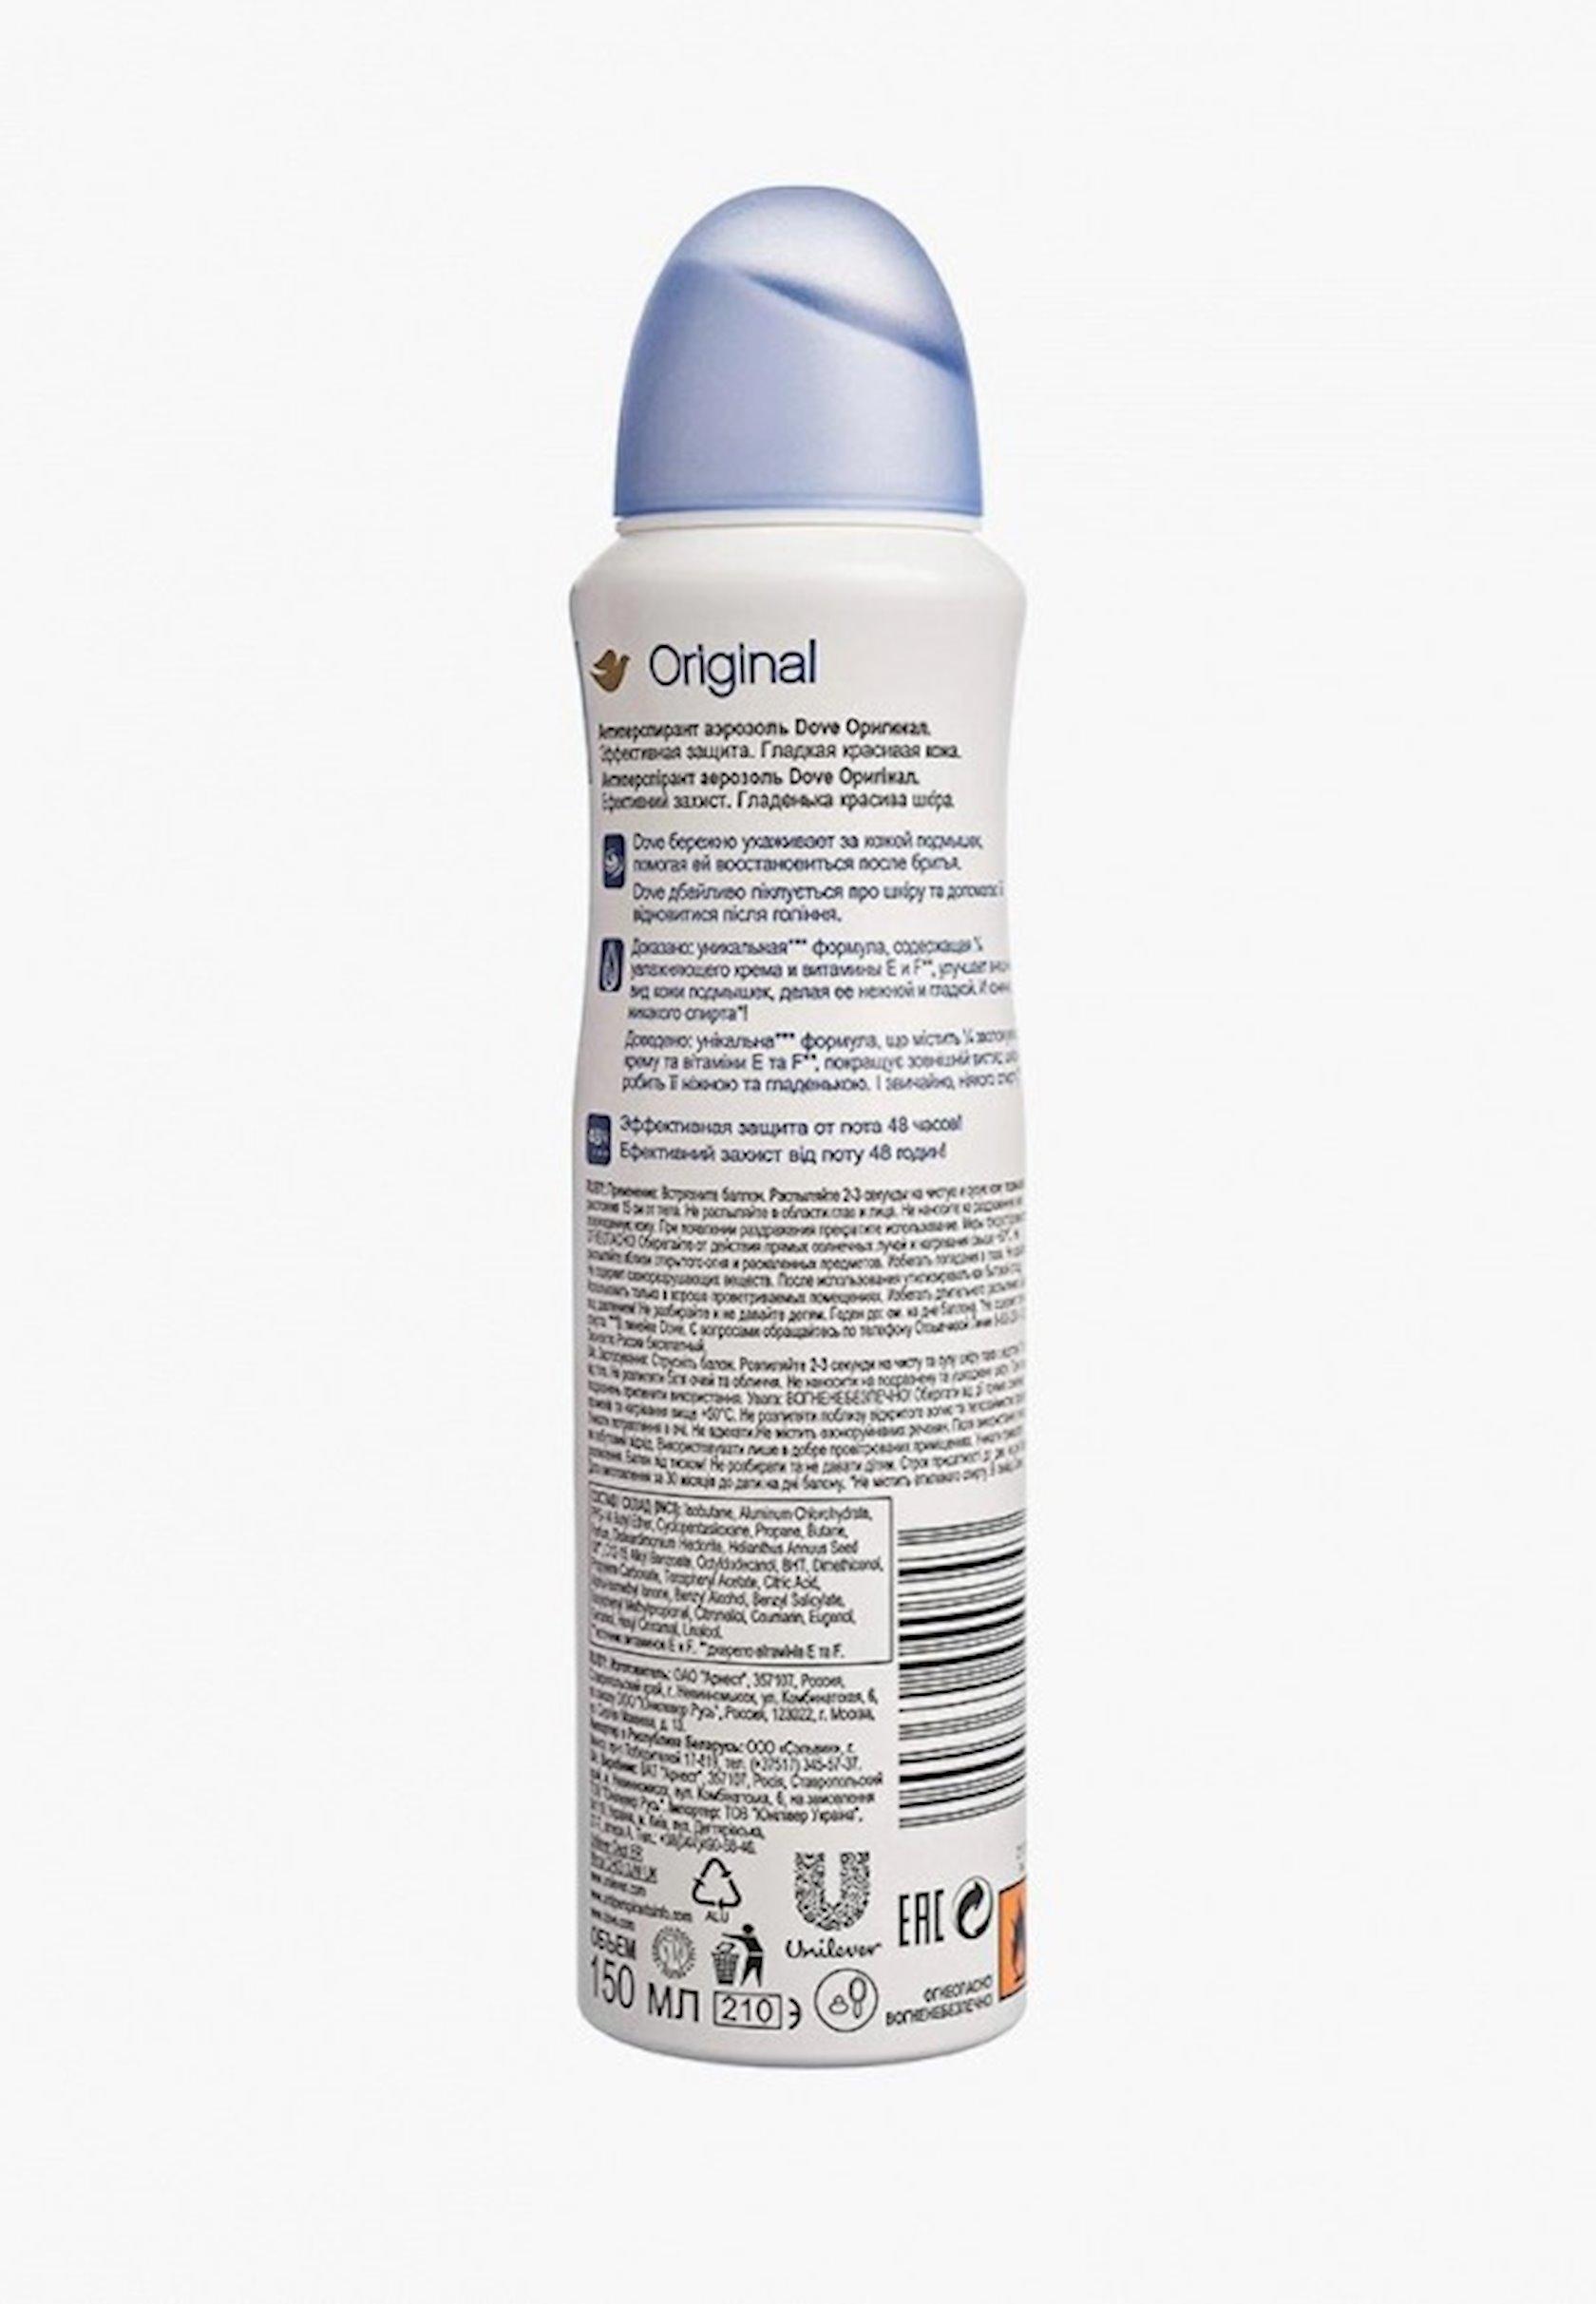 Dezodorant-antiperspirant Dove Original 48 saat 150 ml